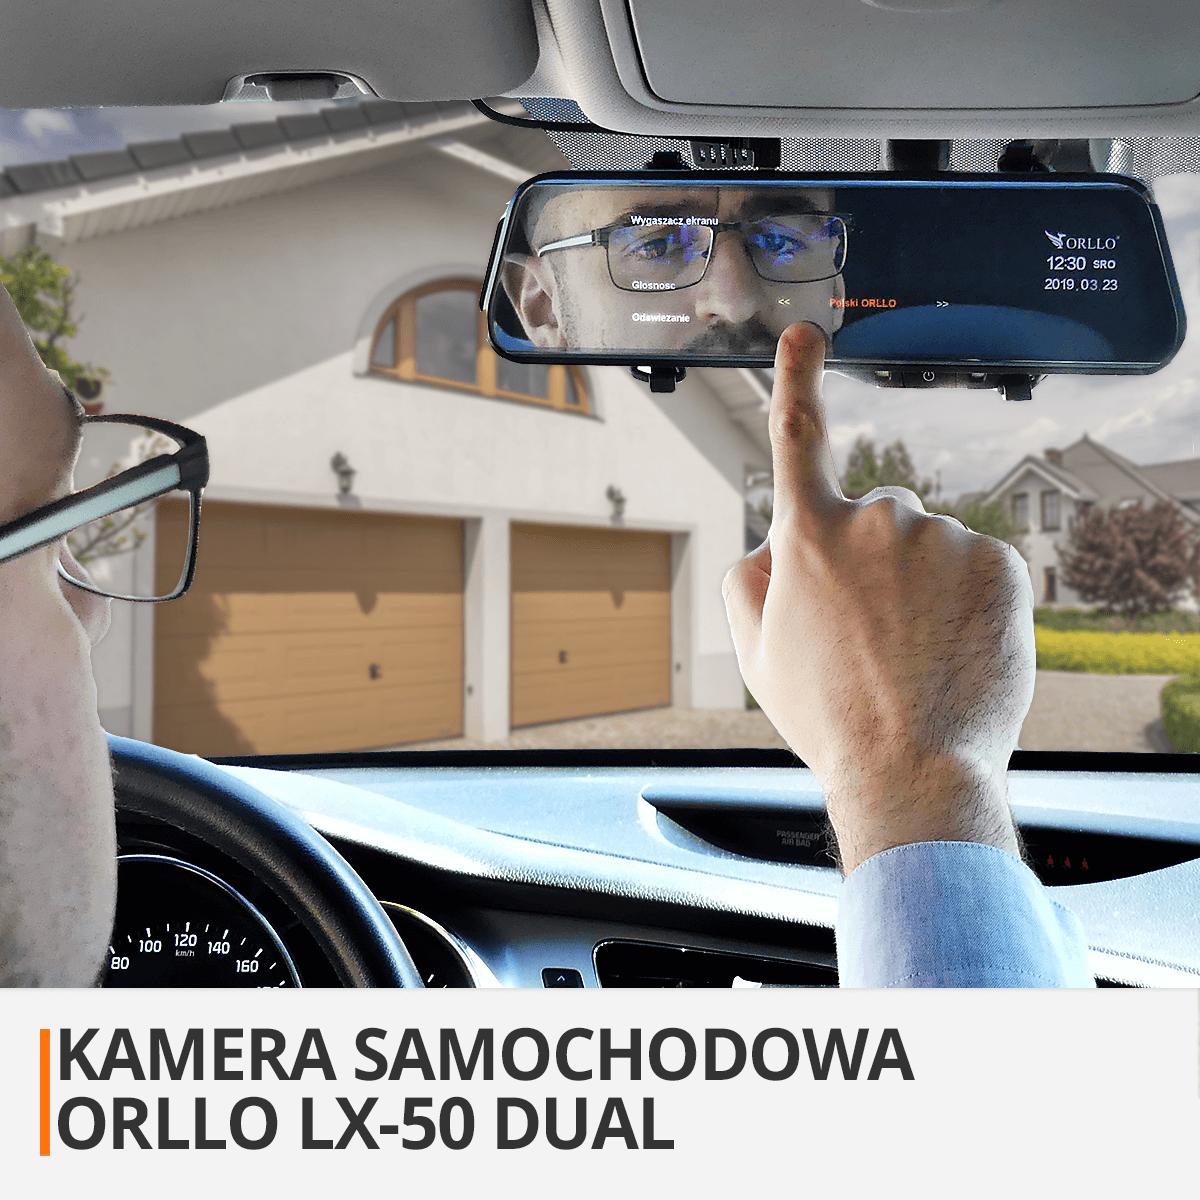 Kamera-samochodowa-cofania-fullhd-orllo-pl